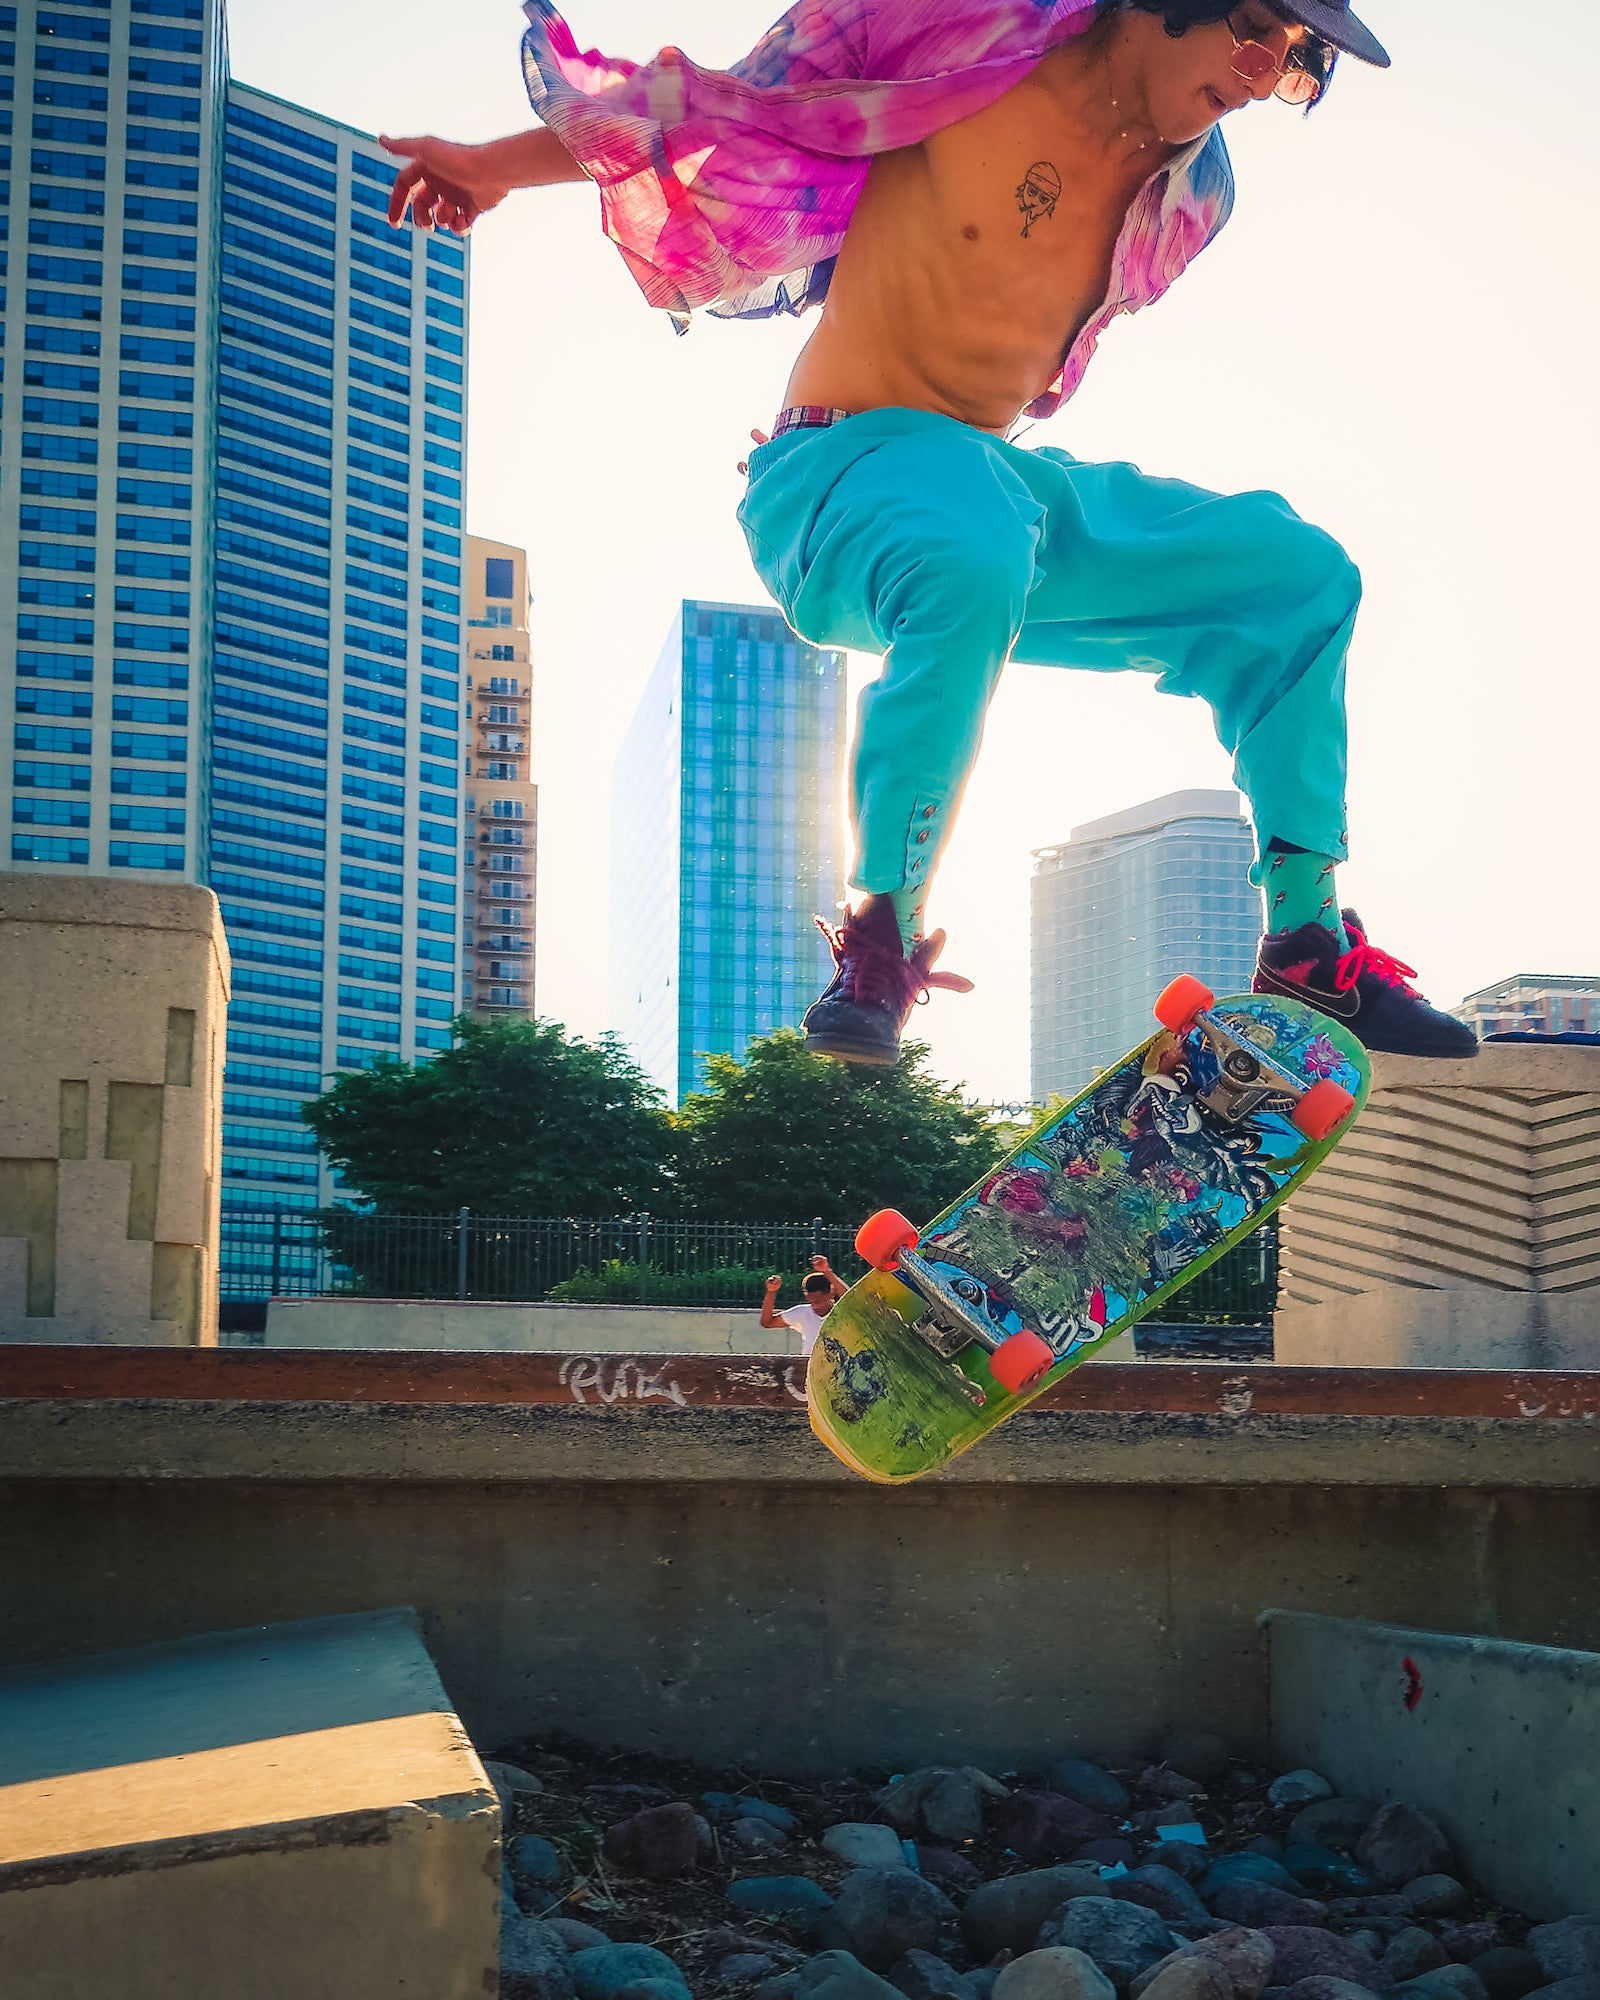 Alpha-Universe-Mike-Meyers-Xperia-1-II-skateboard.jpeg